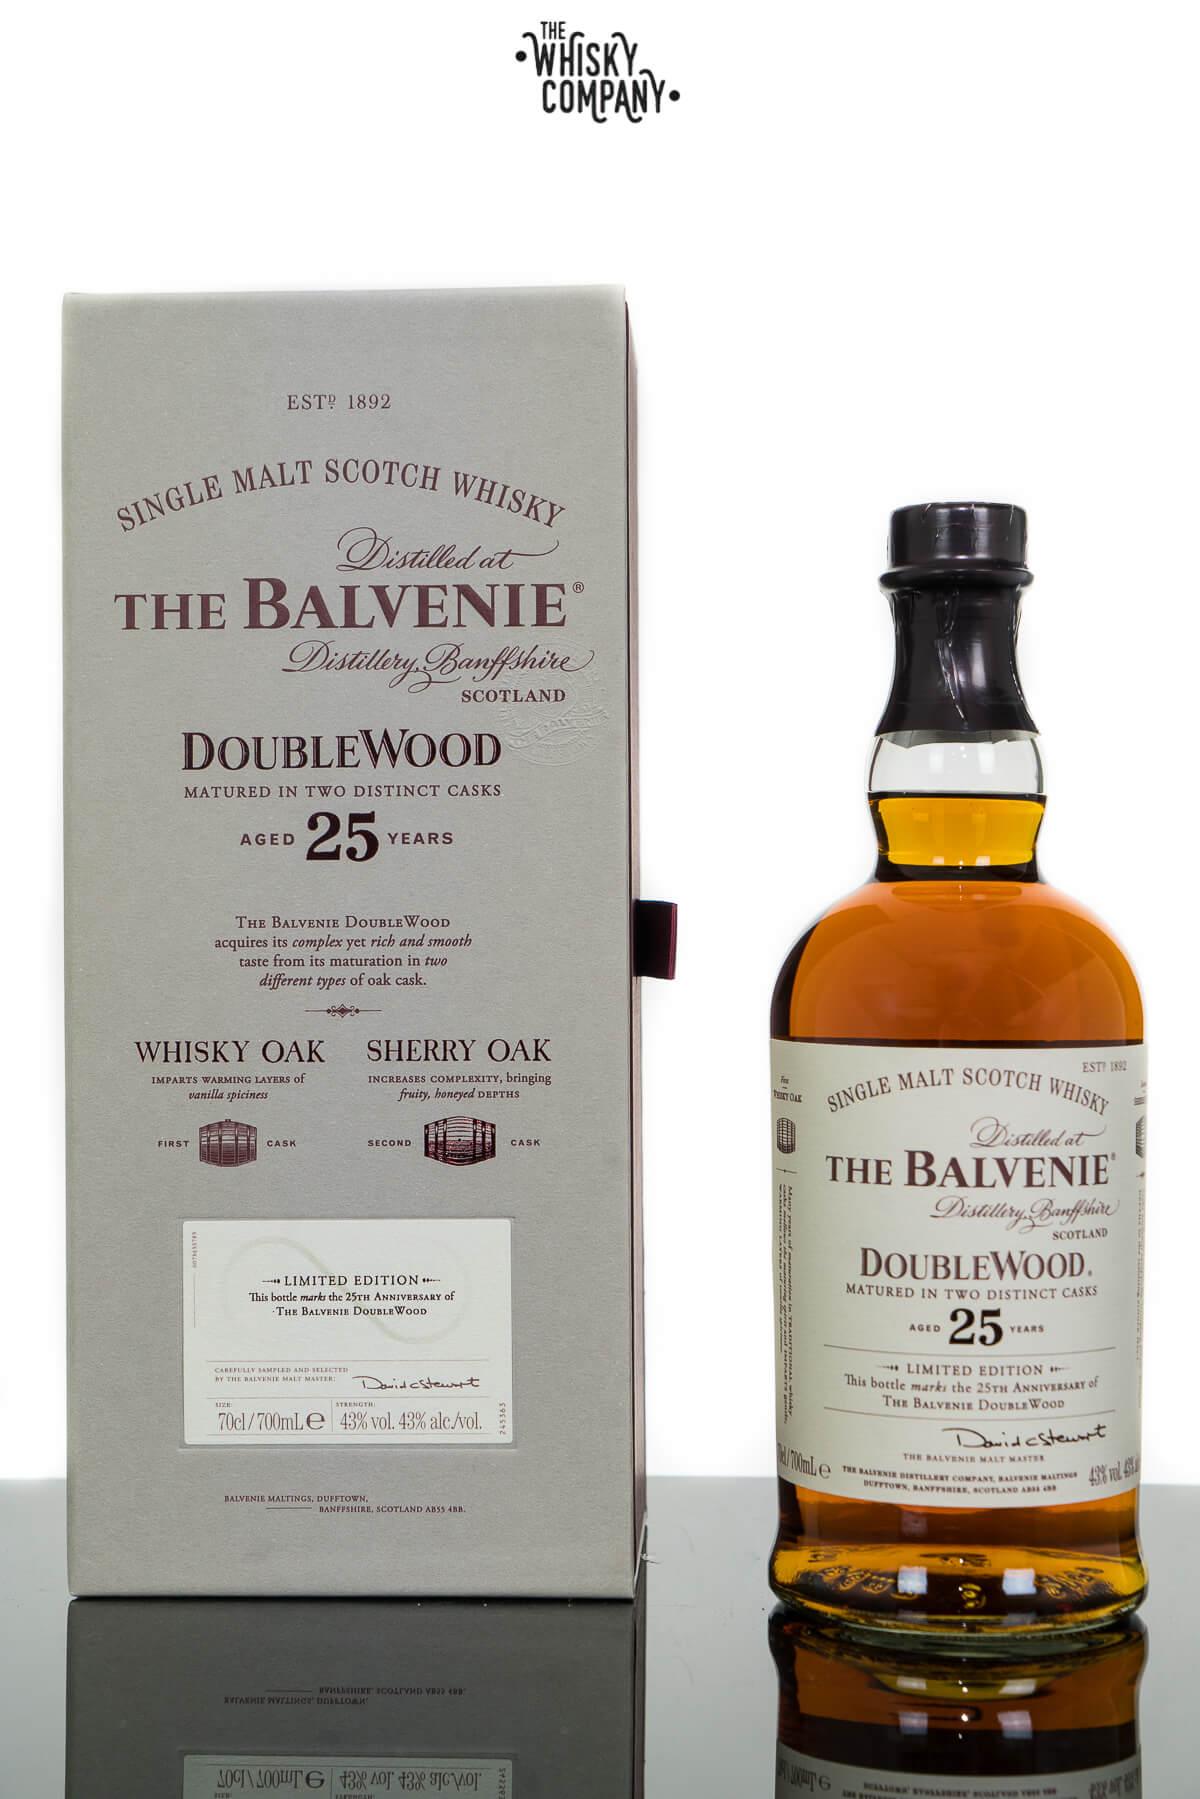 The Balvenie Aged 25 Years DoubleWood Speyside Single Malt Scotch Whisky (700ml)